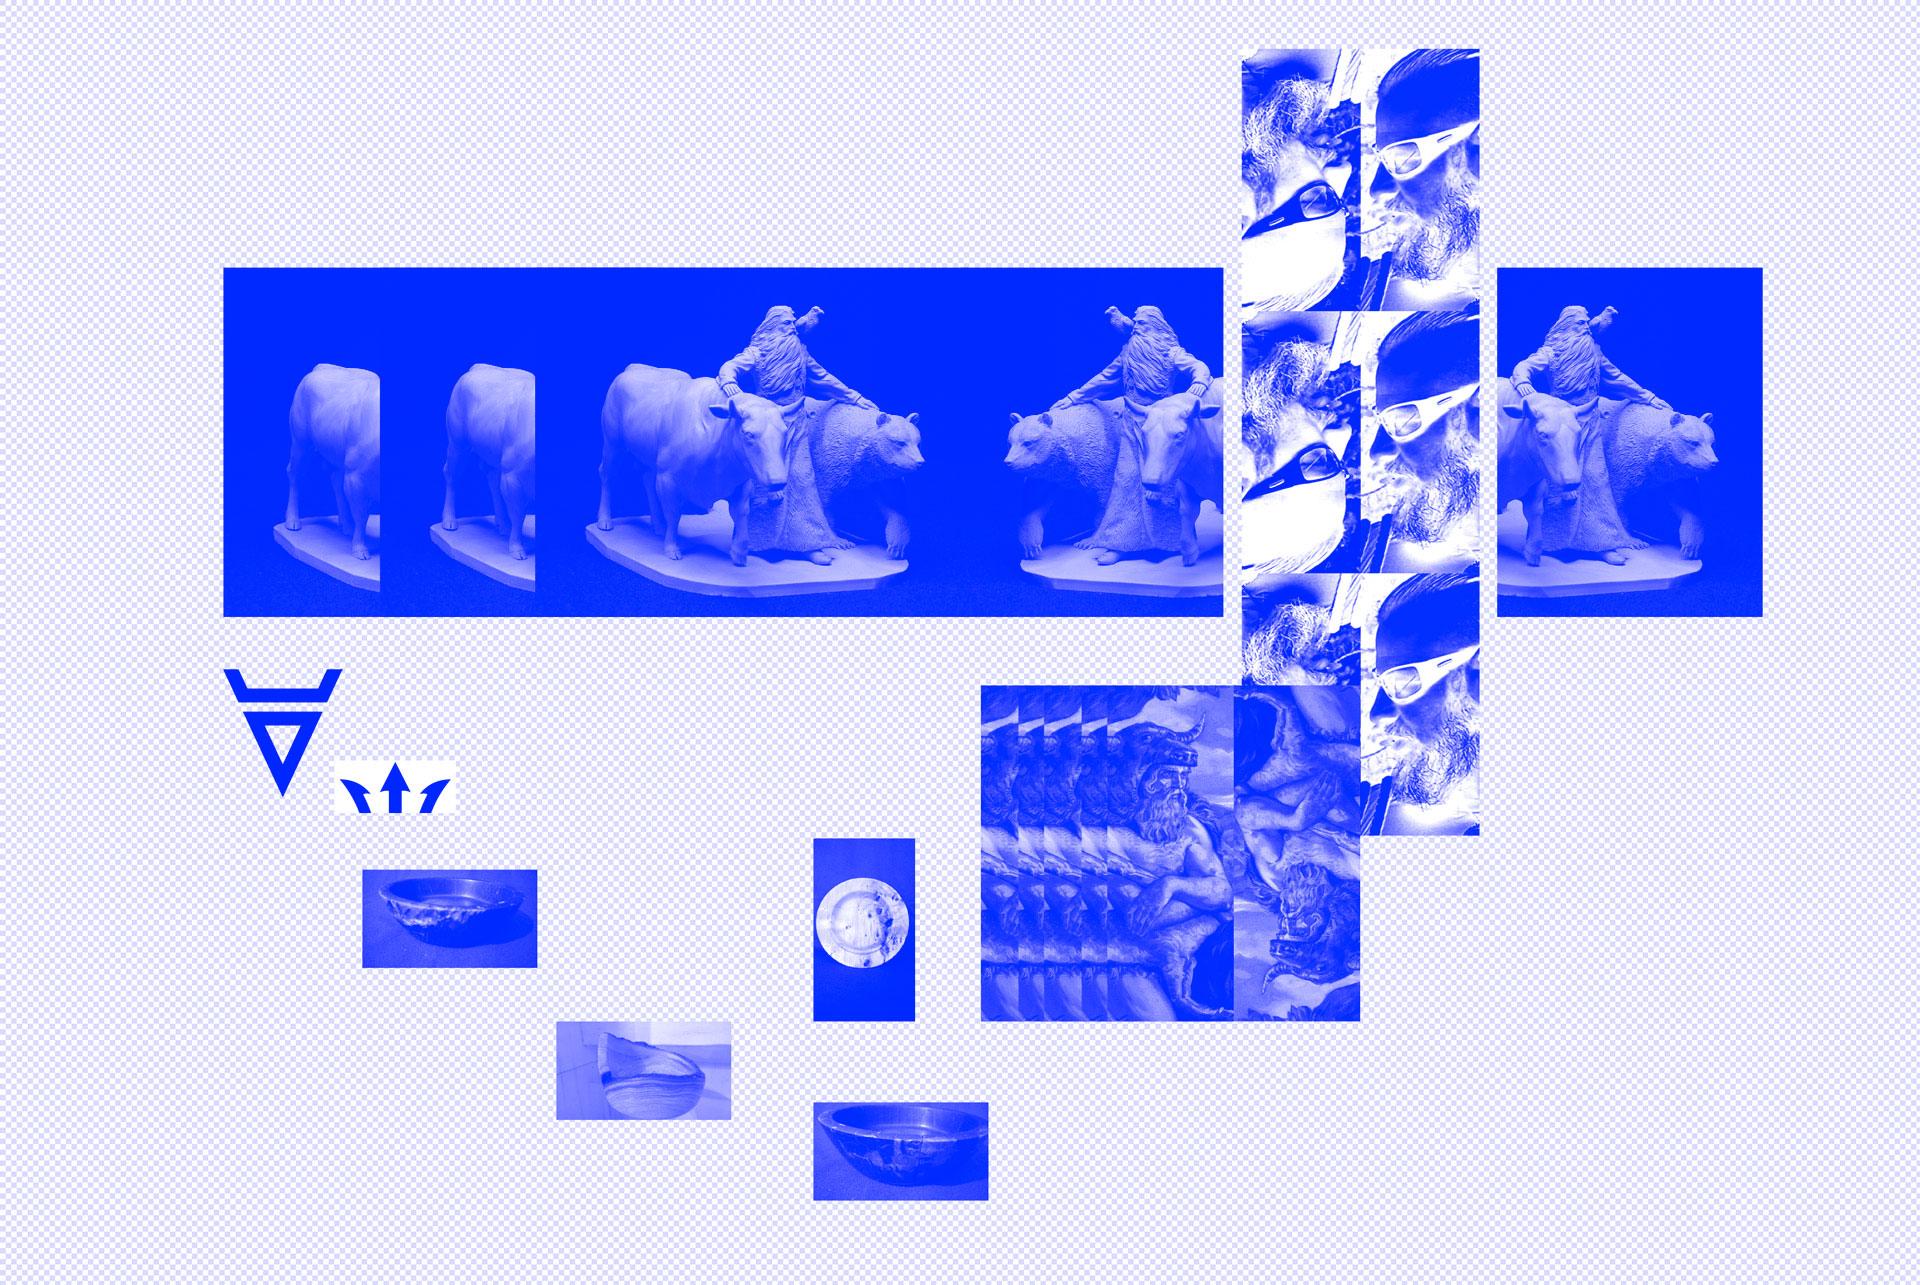 Veleswood, koncept, moodboard, grafický dizajn